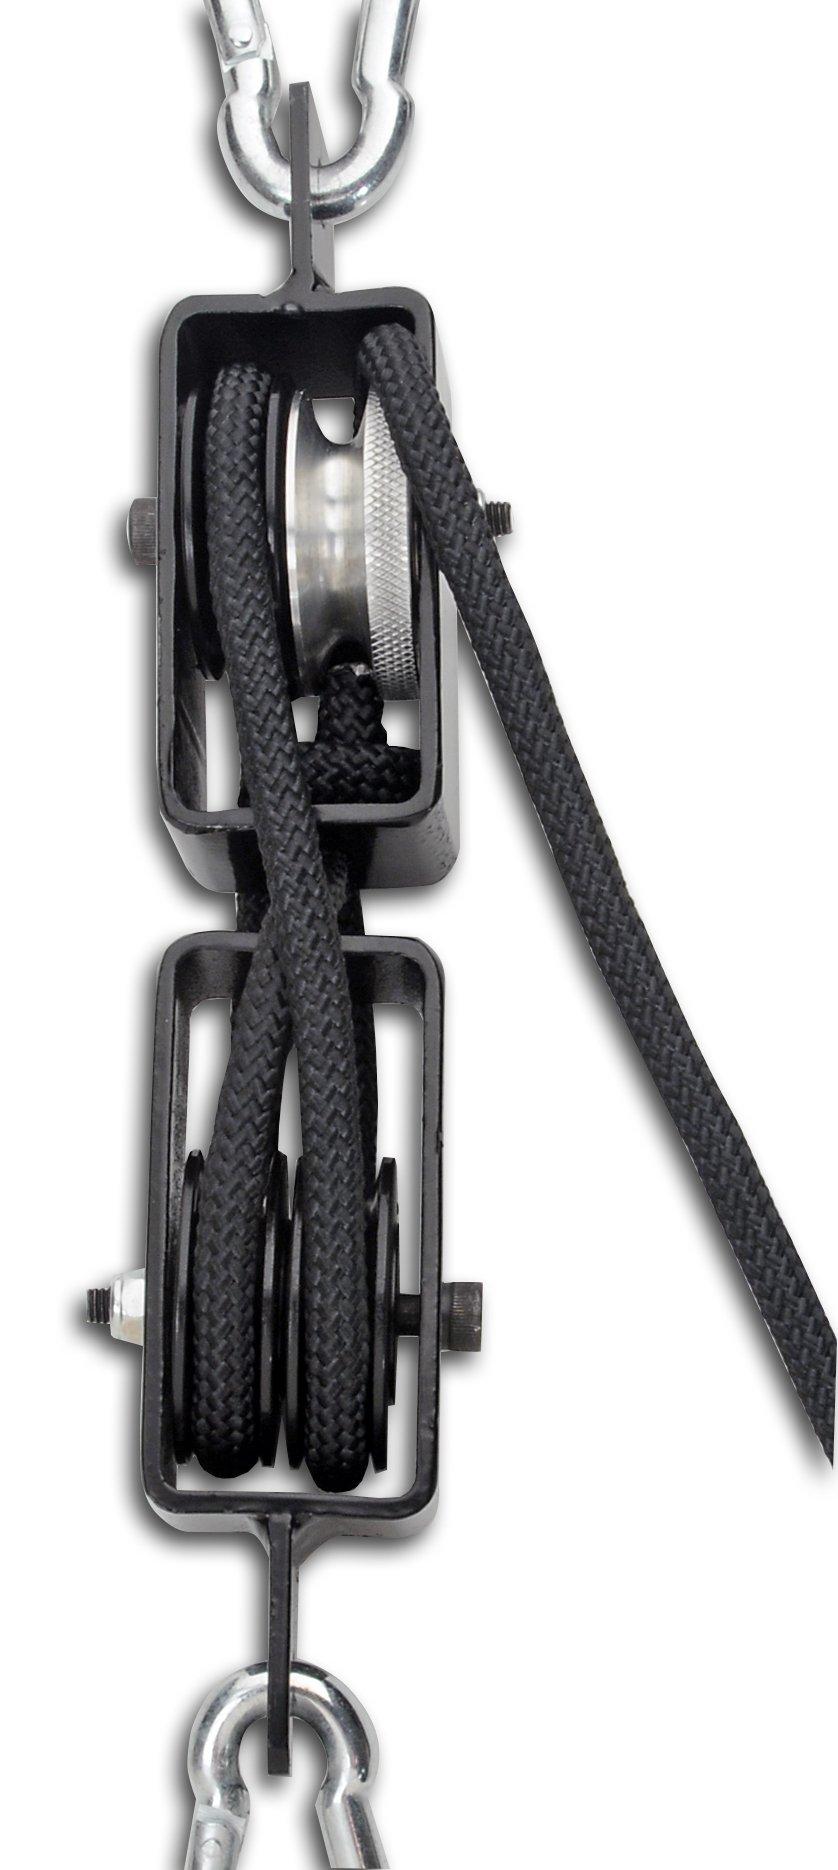 CRKT Hoist'N Lok Big Game Hoist Hunting Game Hoist, 4:1 Mechanical Pulley, Secure Cam Lock, Gambrel and Rope HOIST1